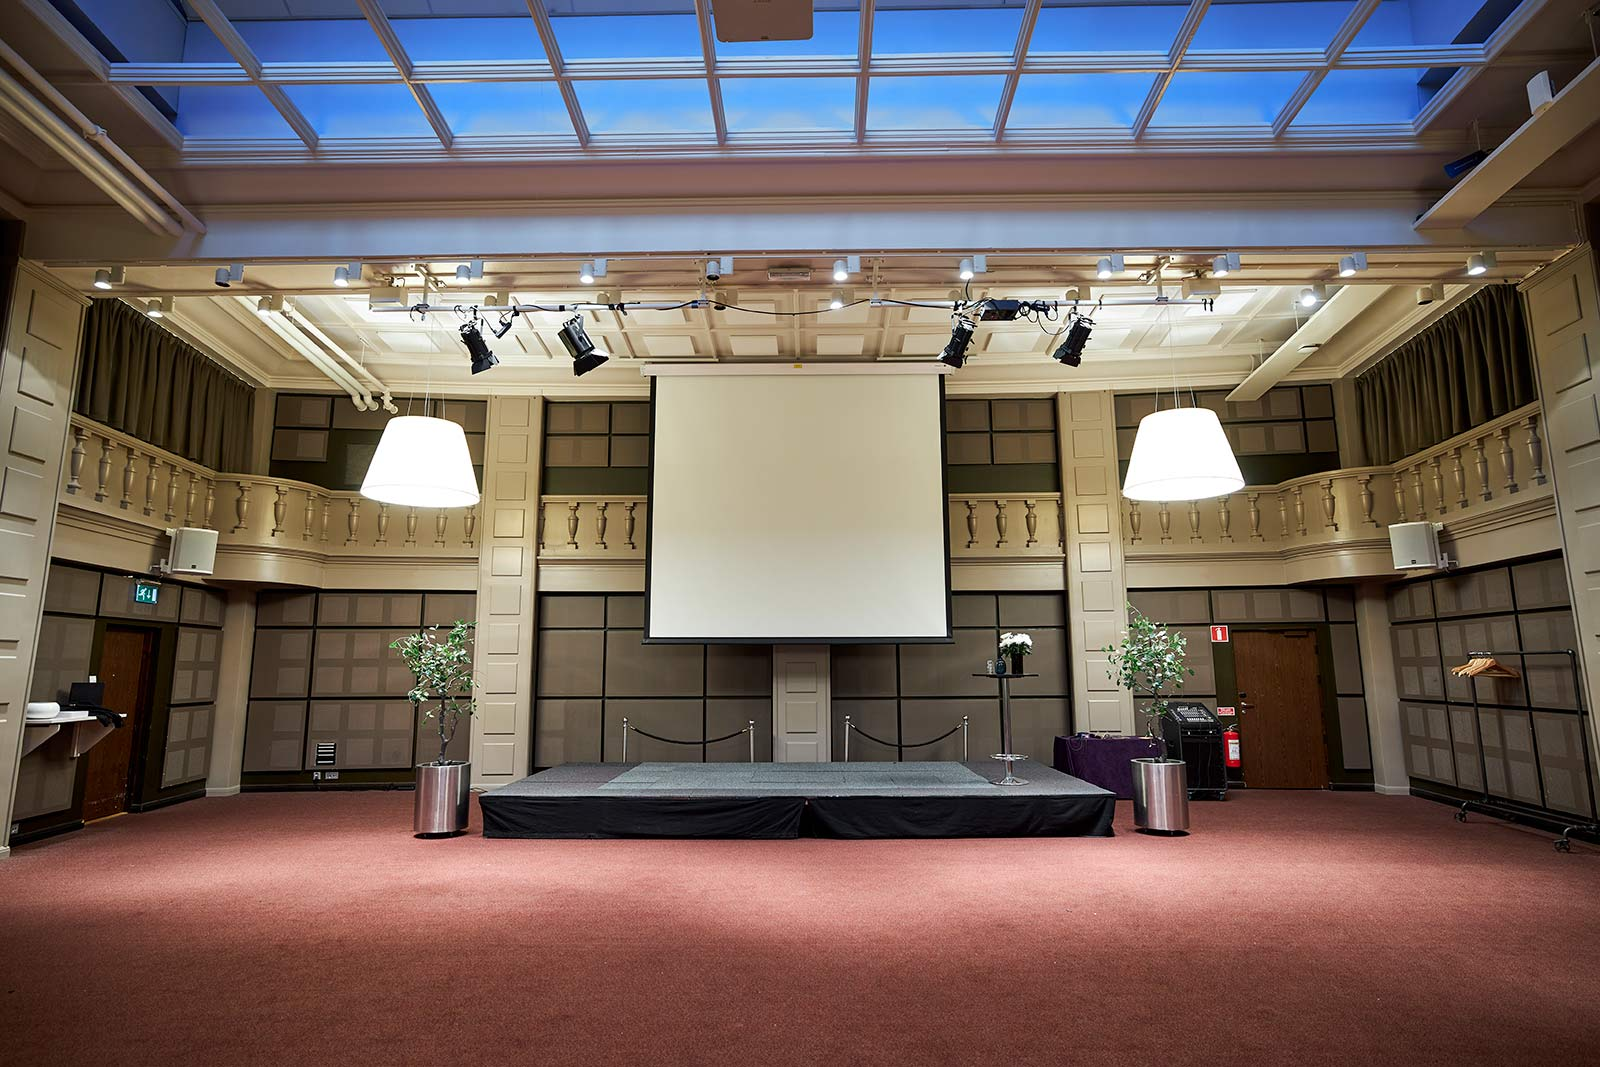 Brevsorterarsalen Konferensrum Clarion Hotel Post